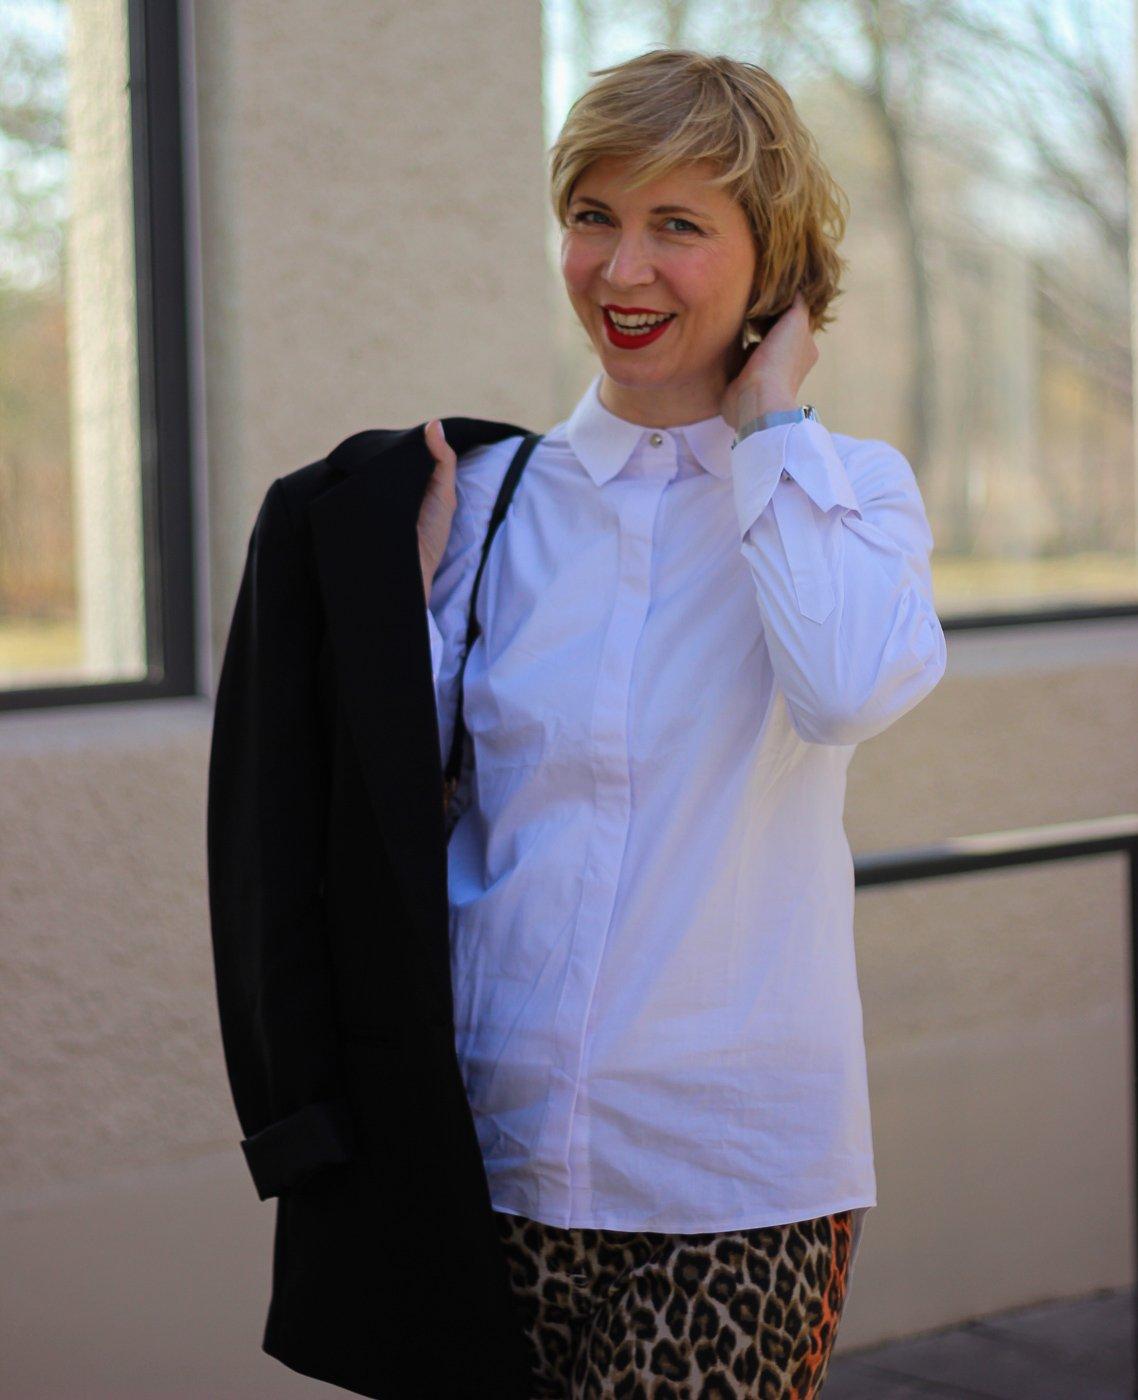 conny doll lifestyle: weiße Bluse, schwarzer Blazer